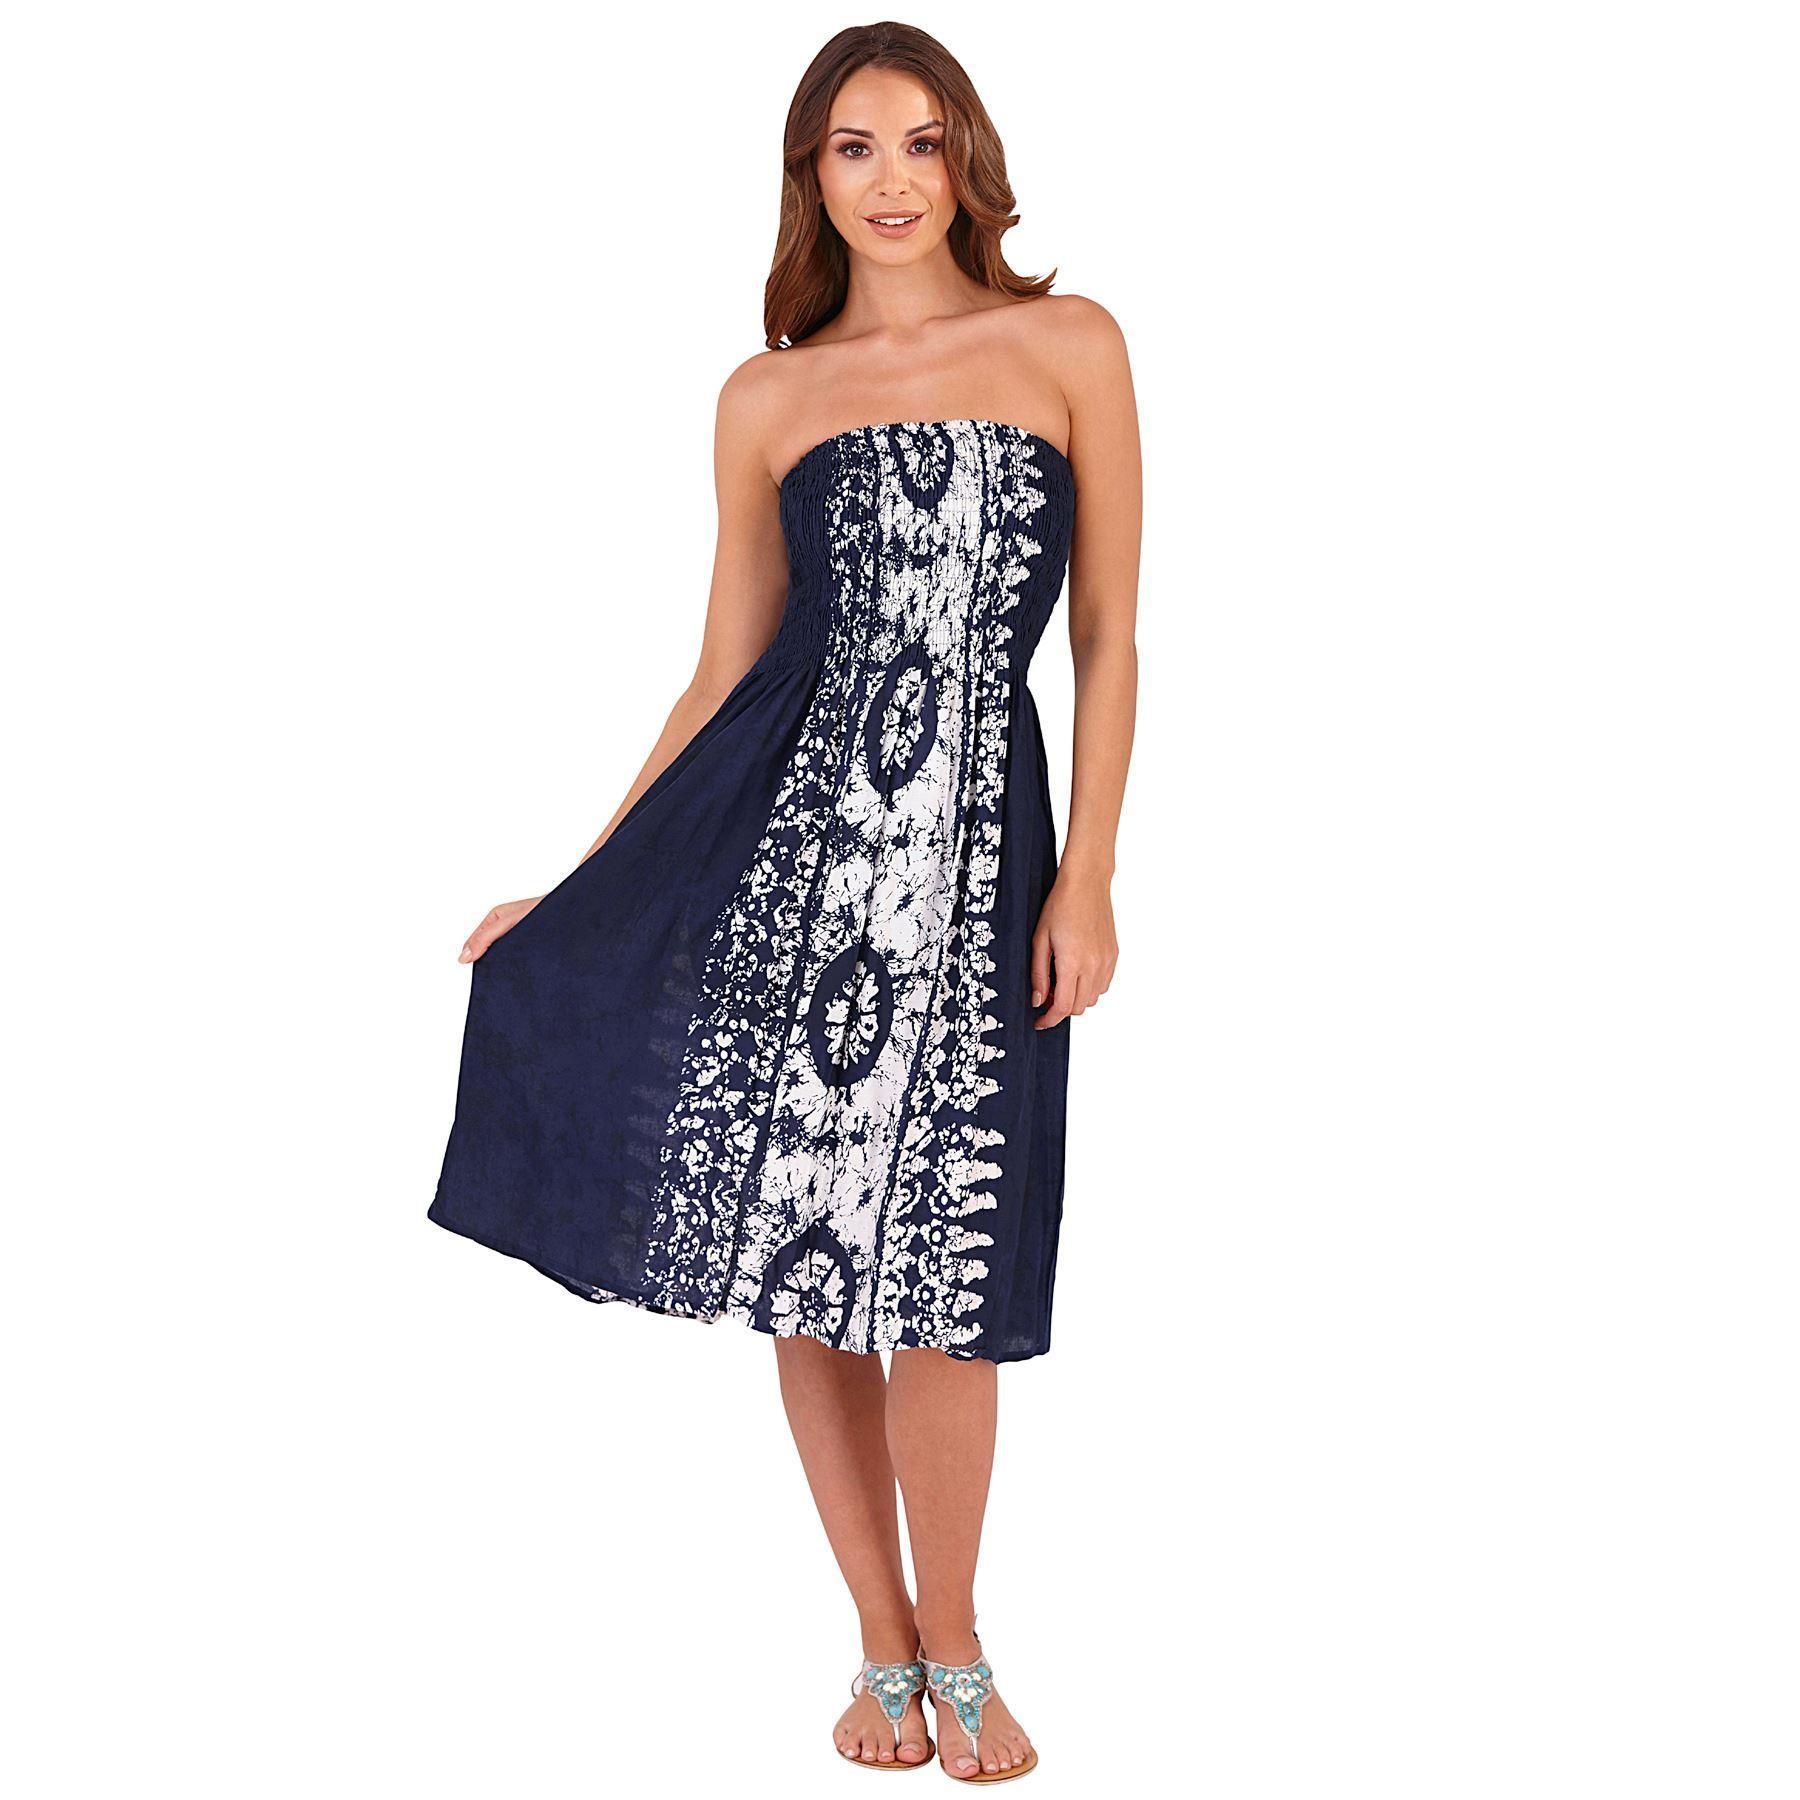 Pistachio Tie Dye 3 in 1 Dress/Skirt - Navy